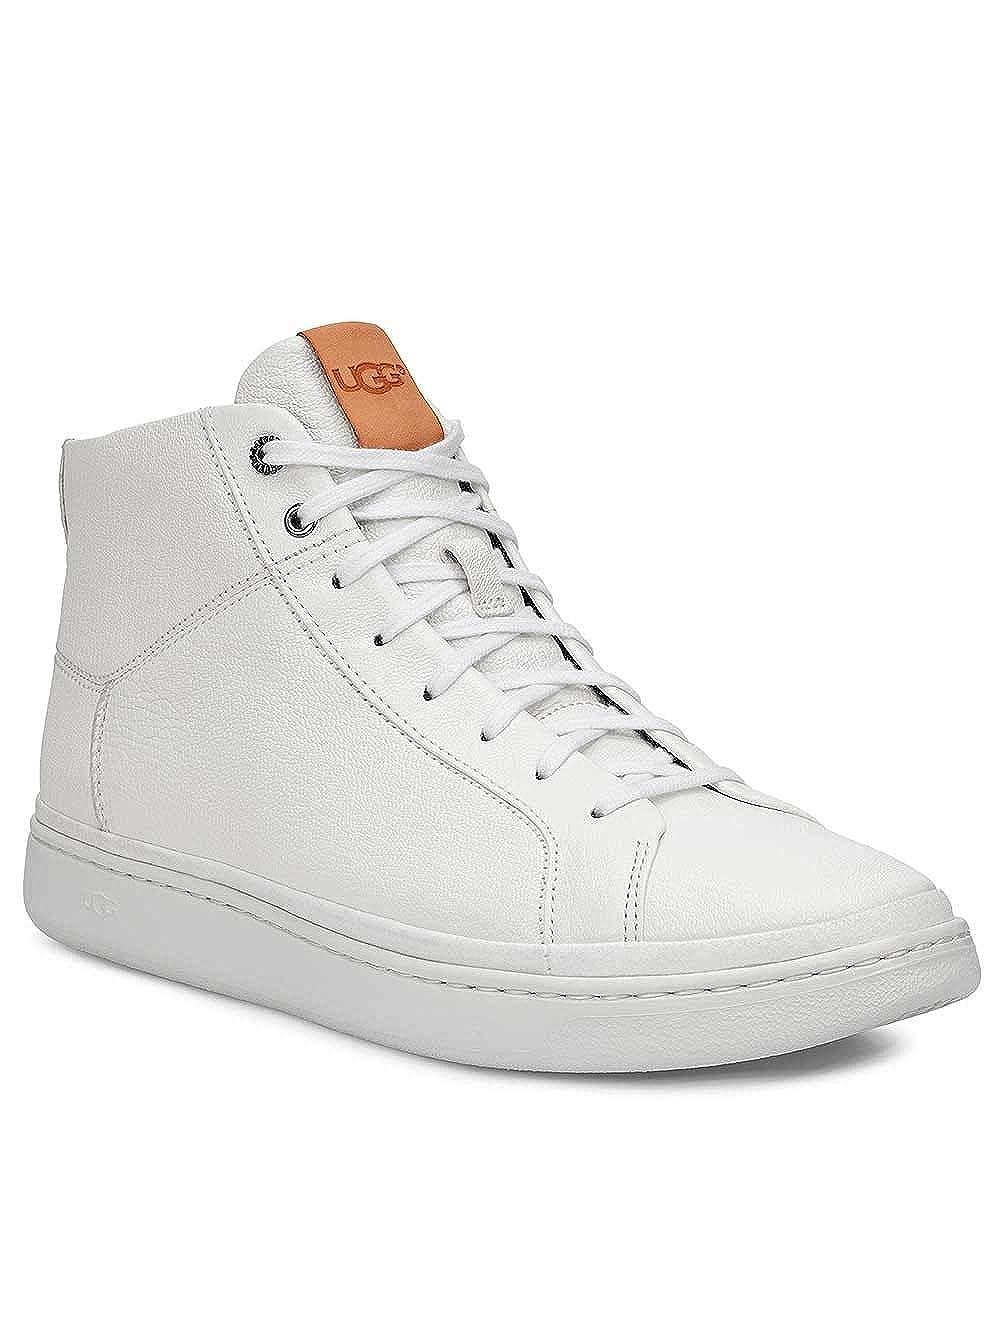 25d6c3c9688 UGG Men's Cali Lace High Sneaker